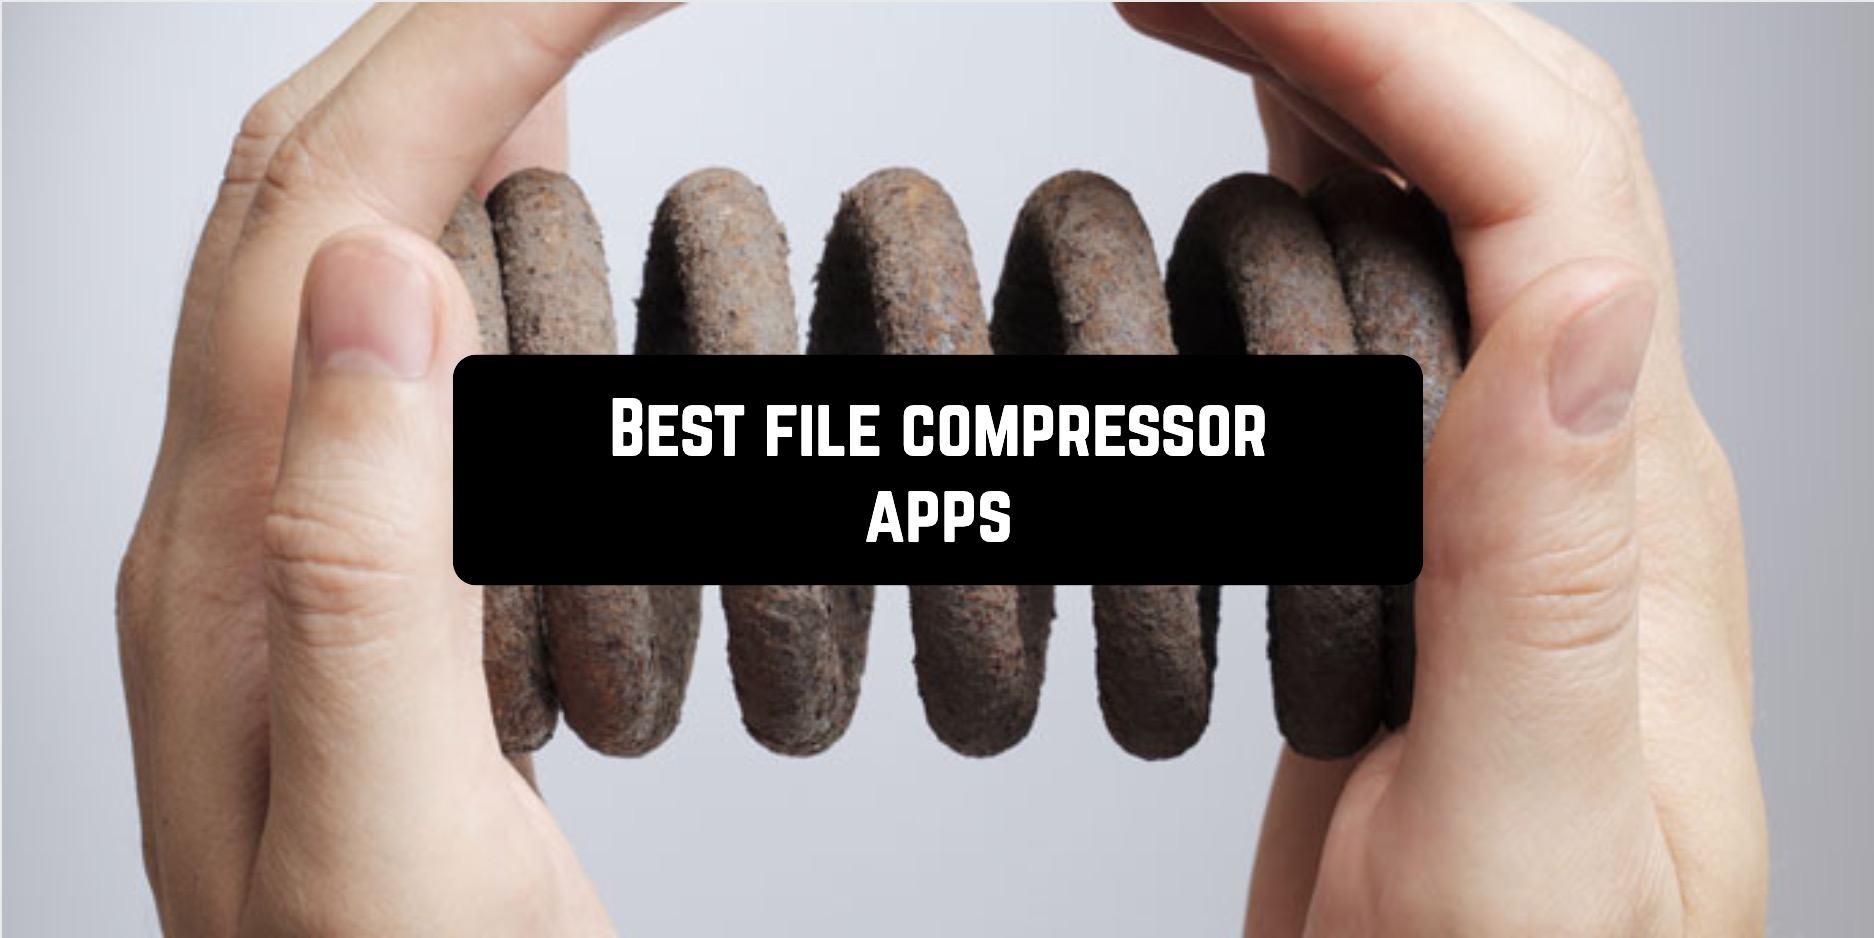 Best file compressor applications